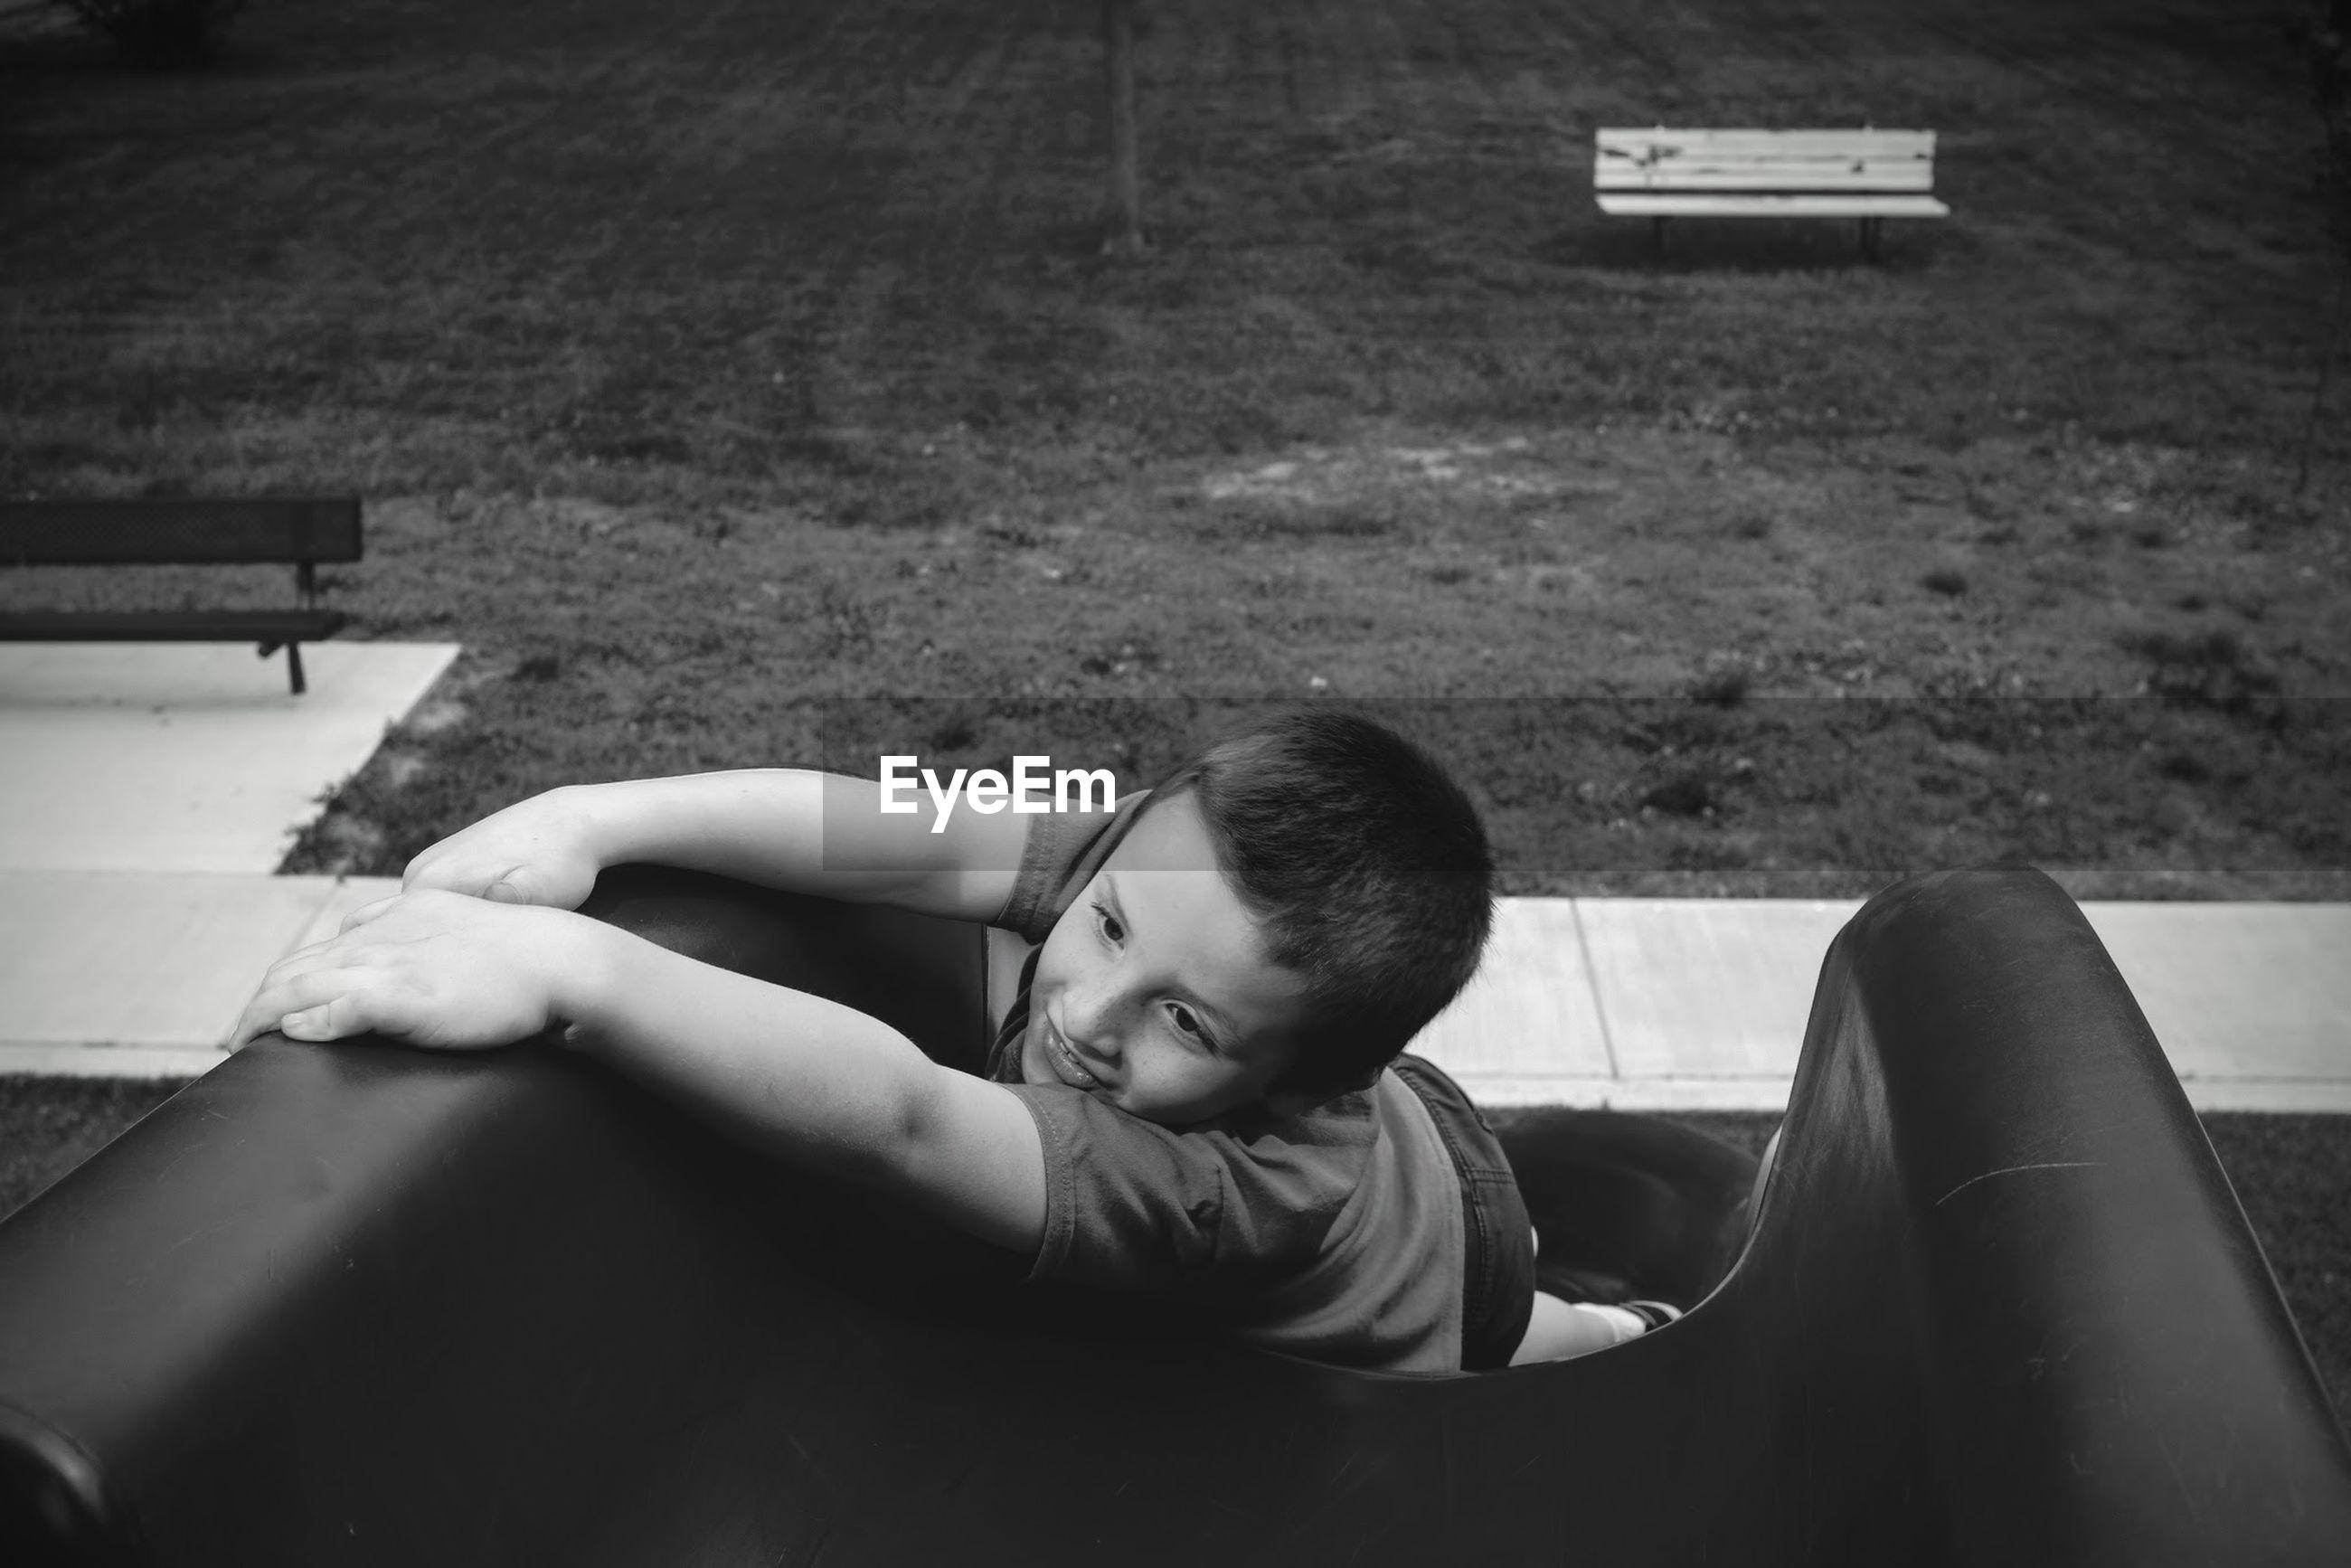 High angle view of boy enjoying slide at playground